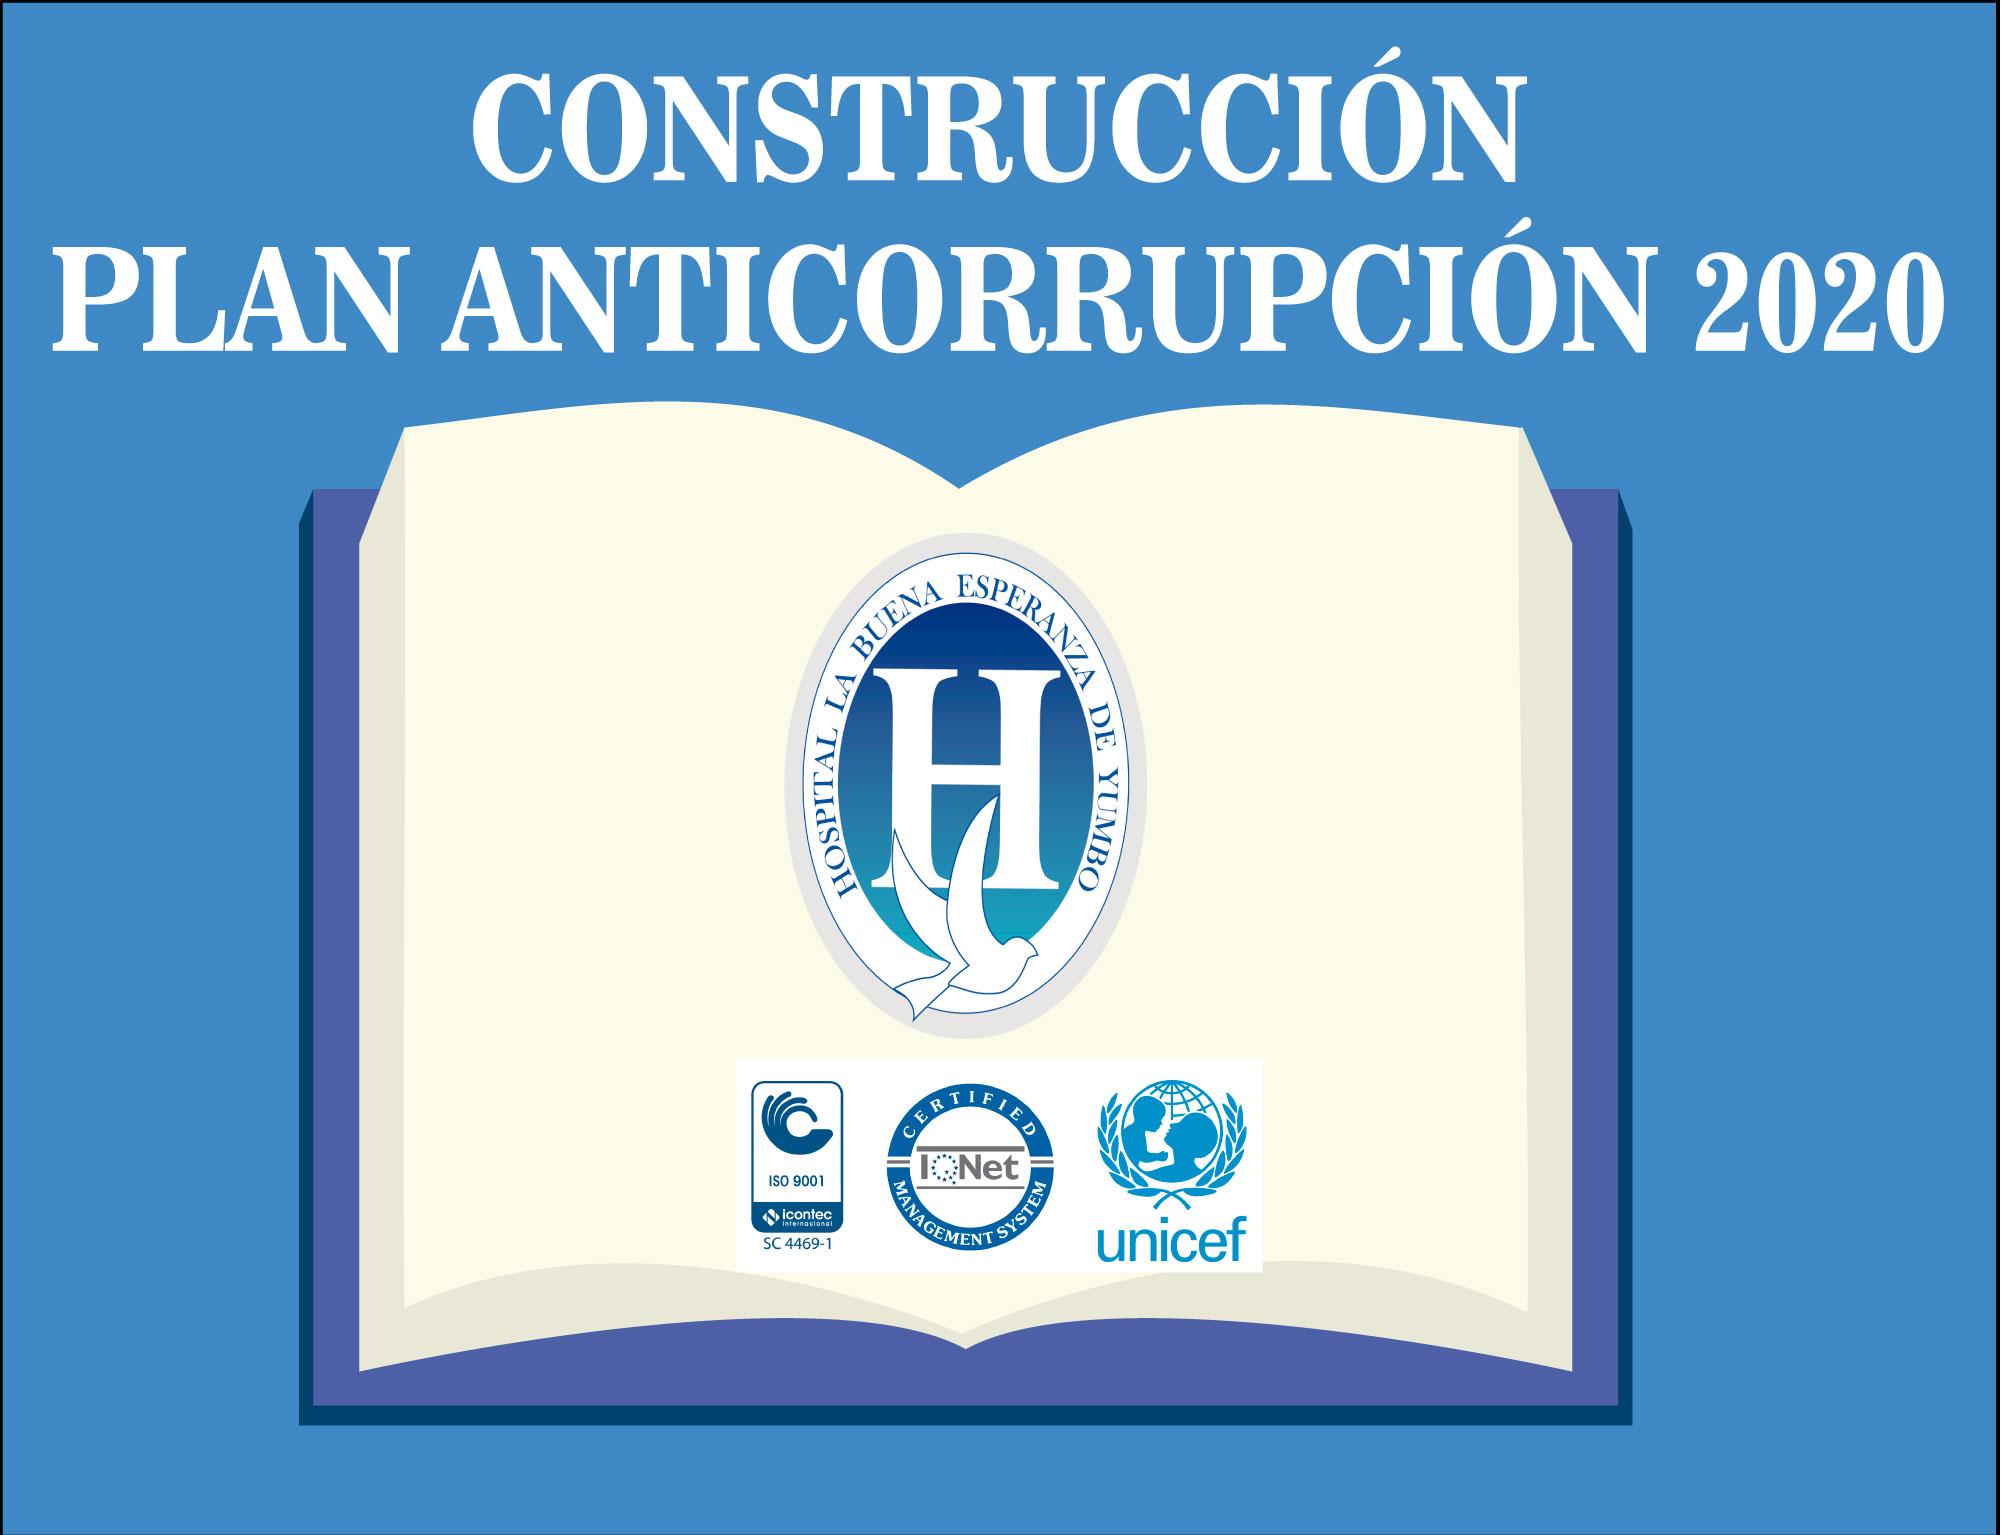 Construcción Plan Anticorrupución 2020.